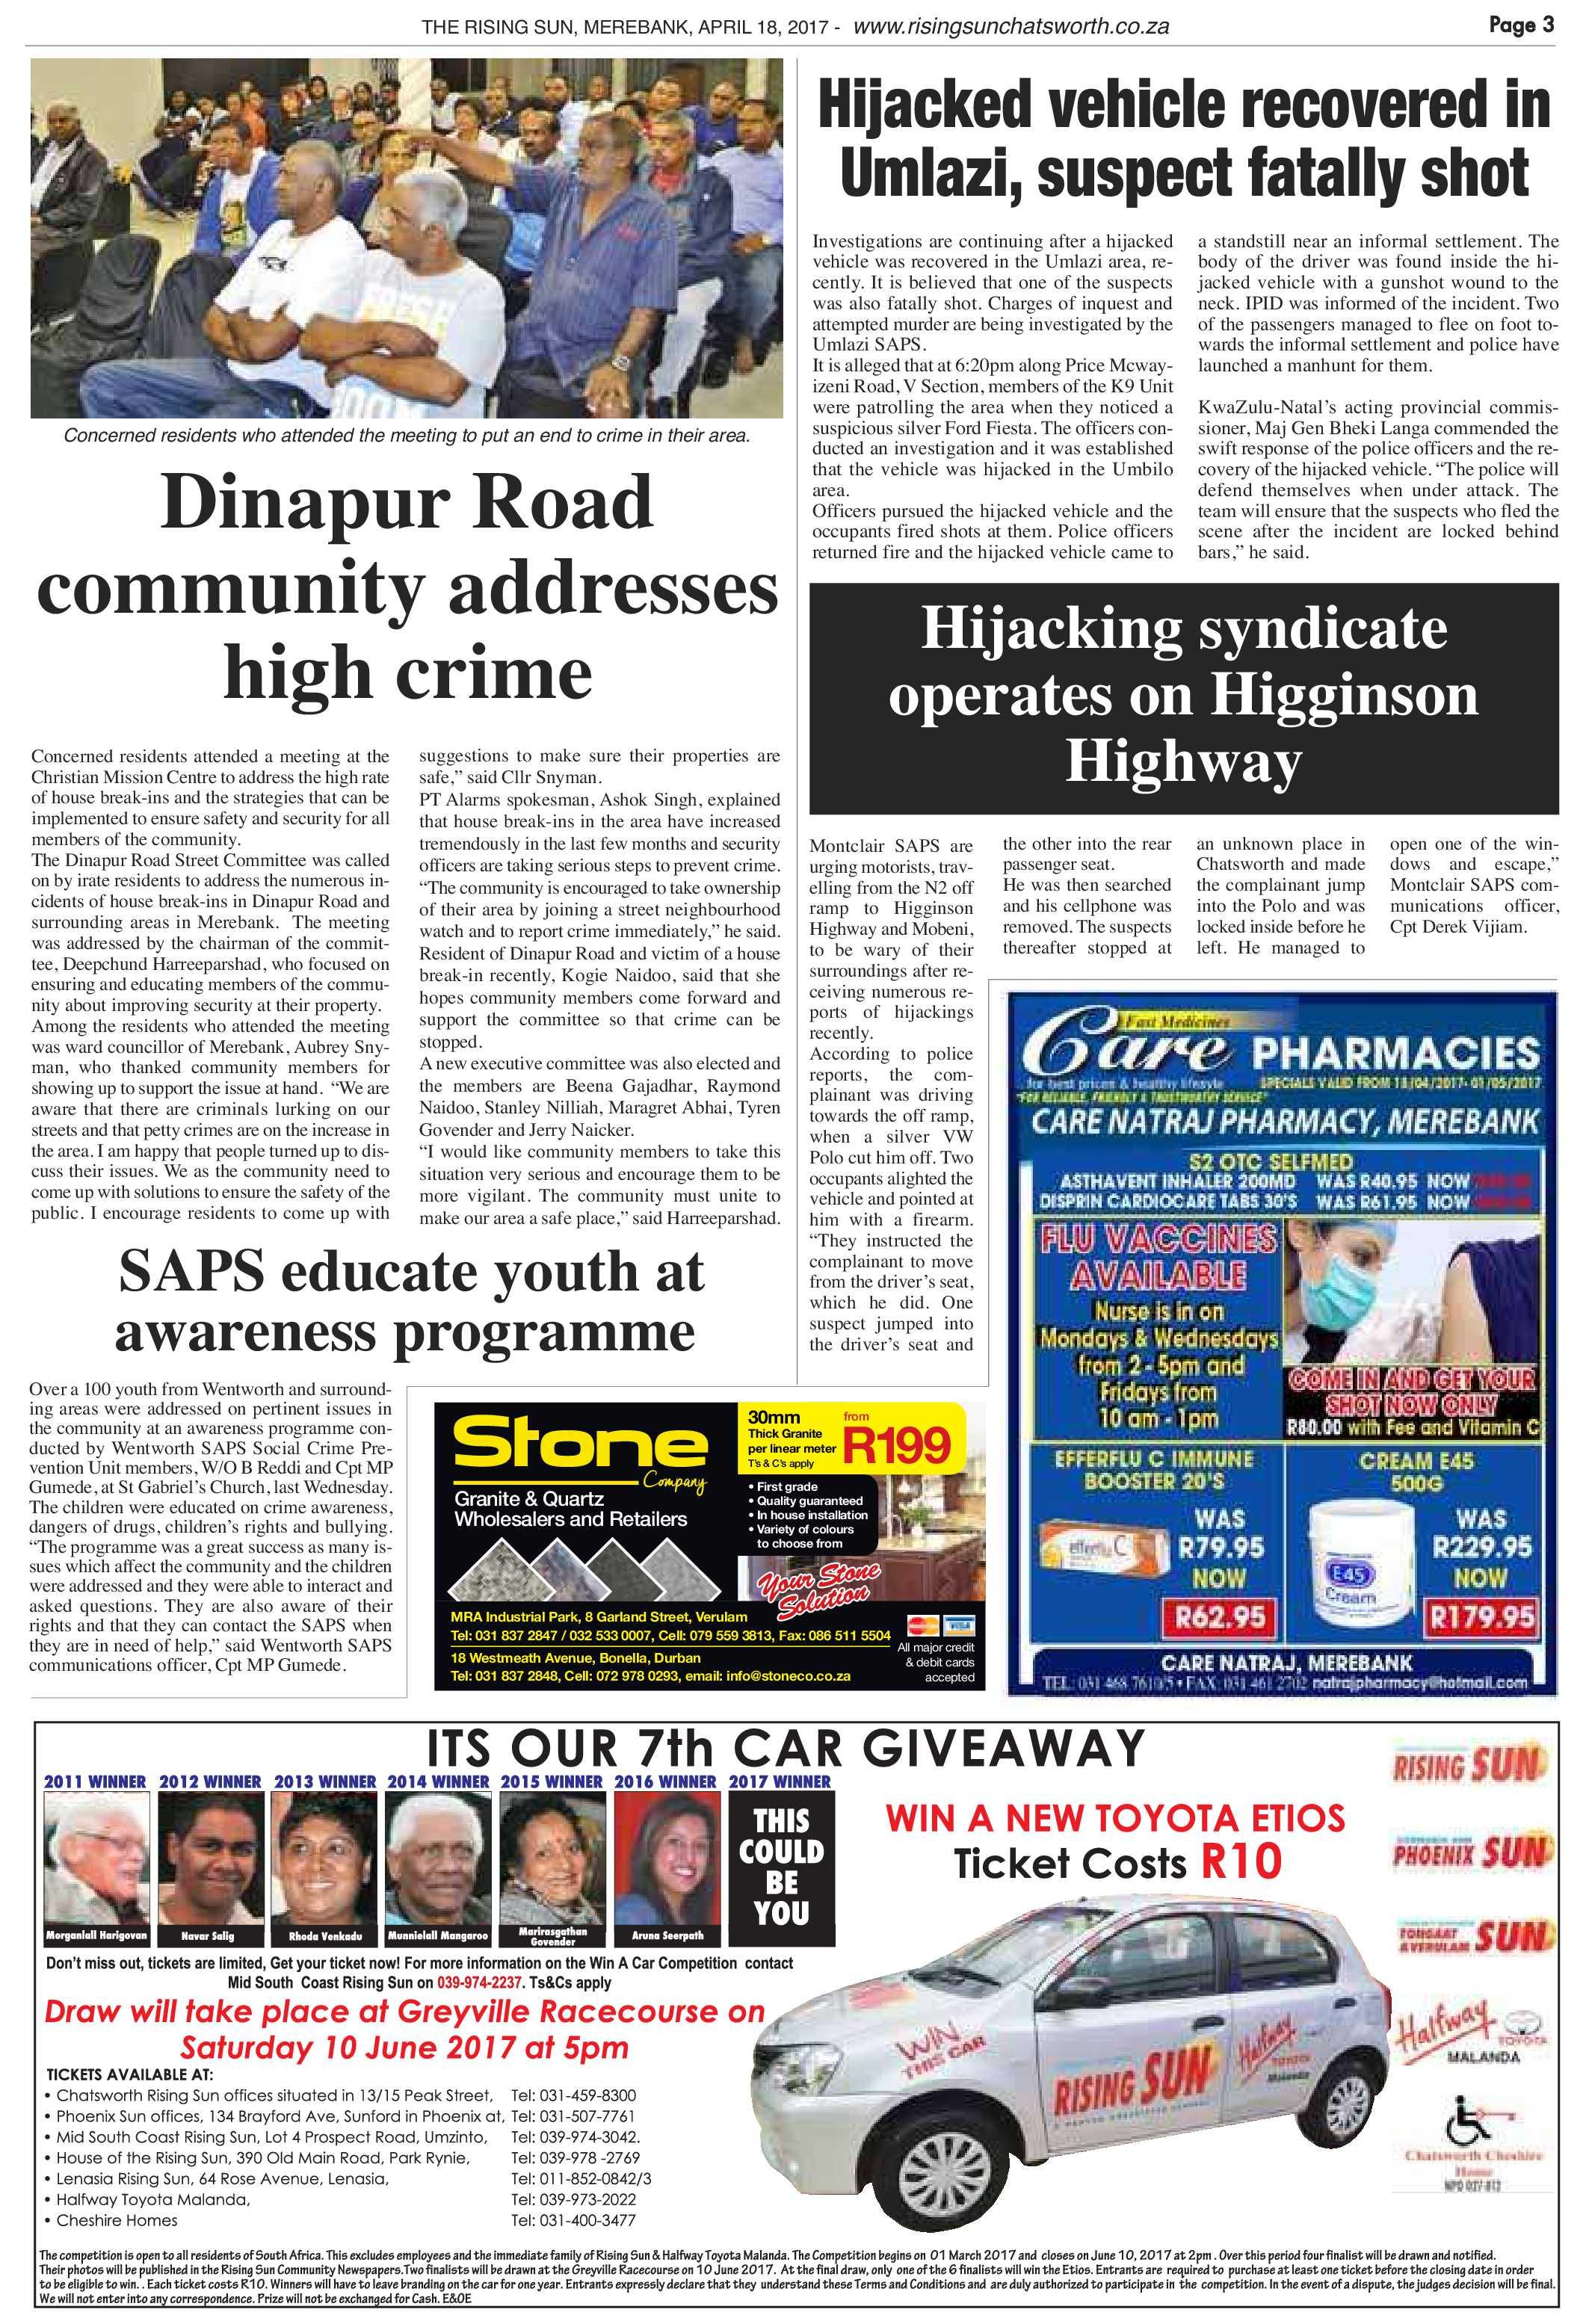 merebank-april-18-epapers-page-3